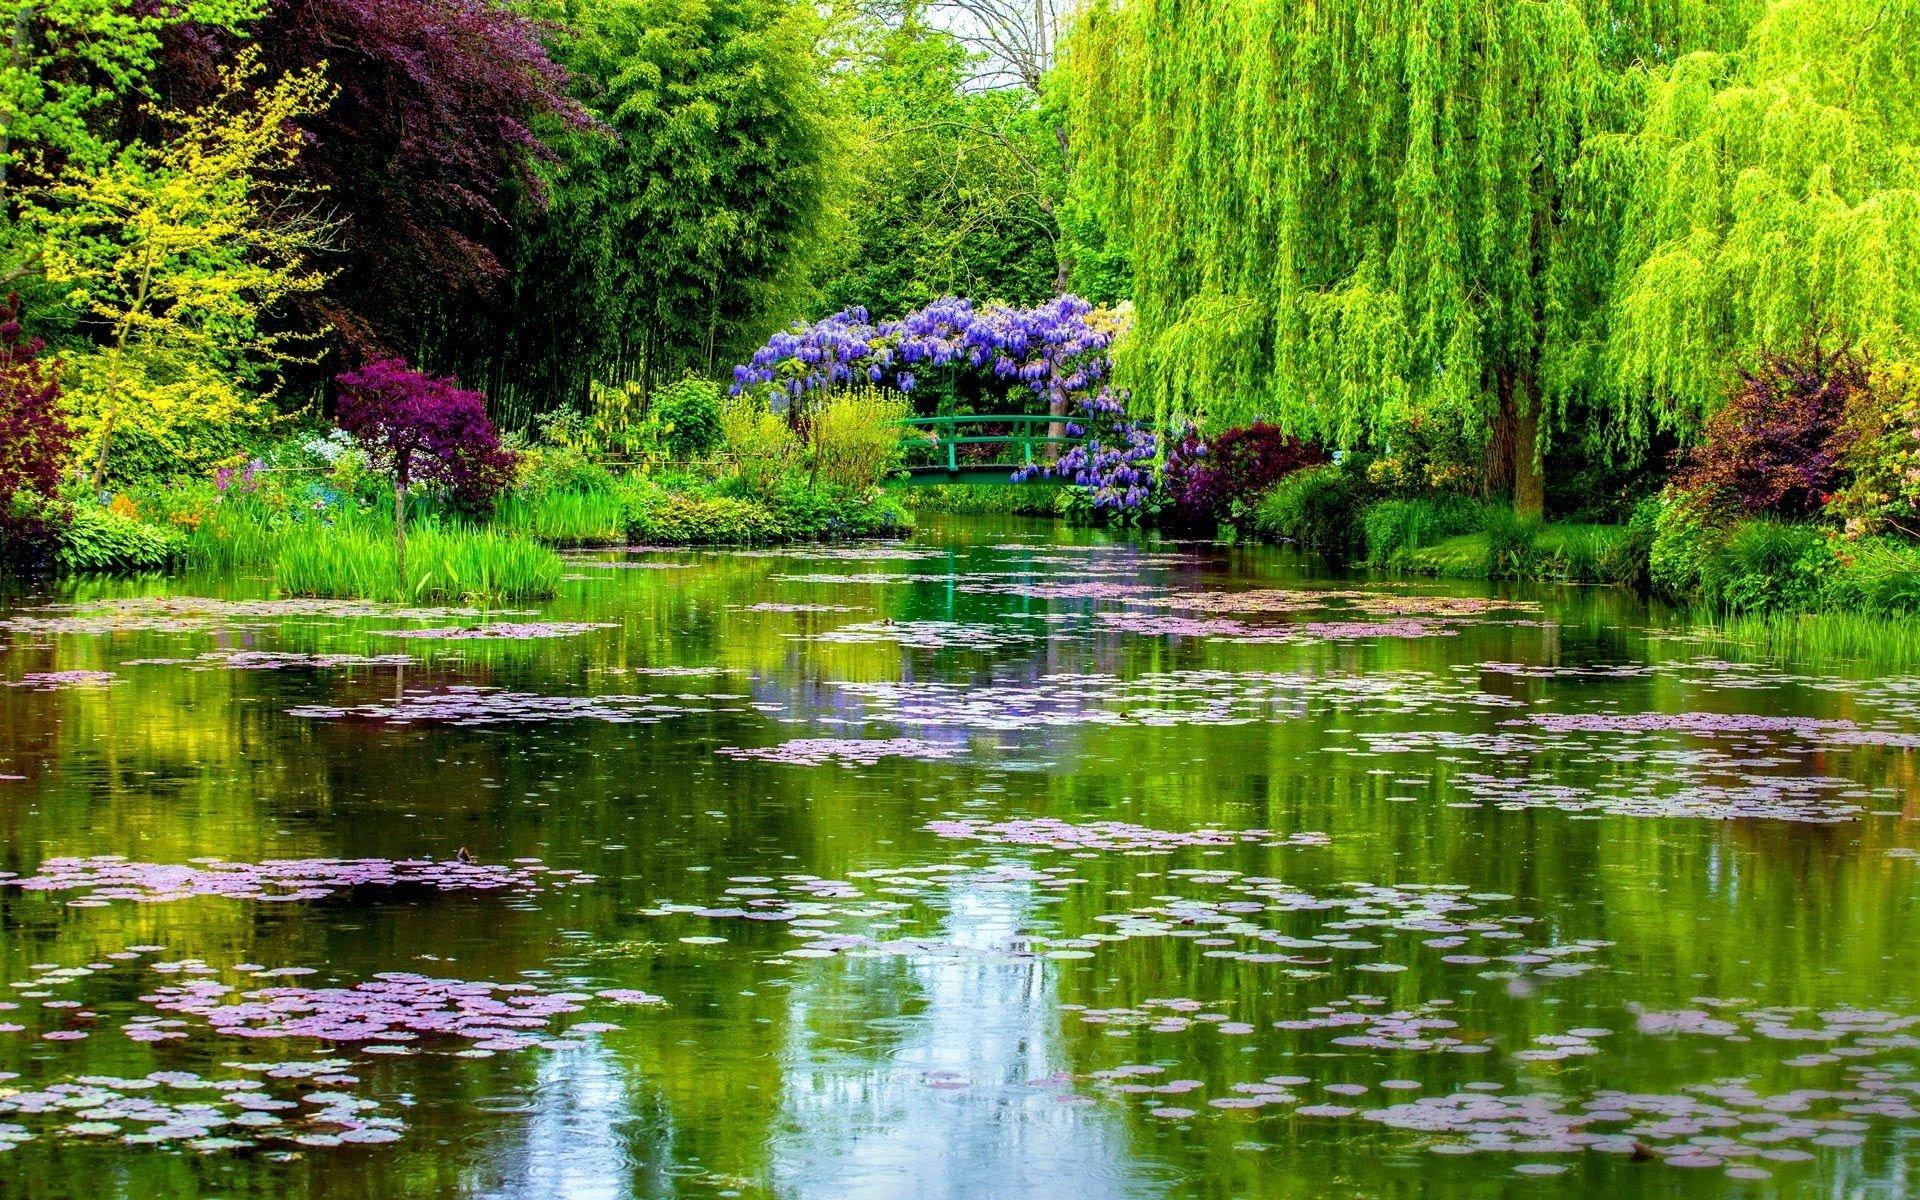 Monet Iphone Wallpaper Quot Monet S Garden Quot In Normandy France Full Hd Wallpaper And